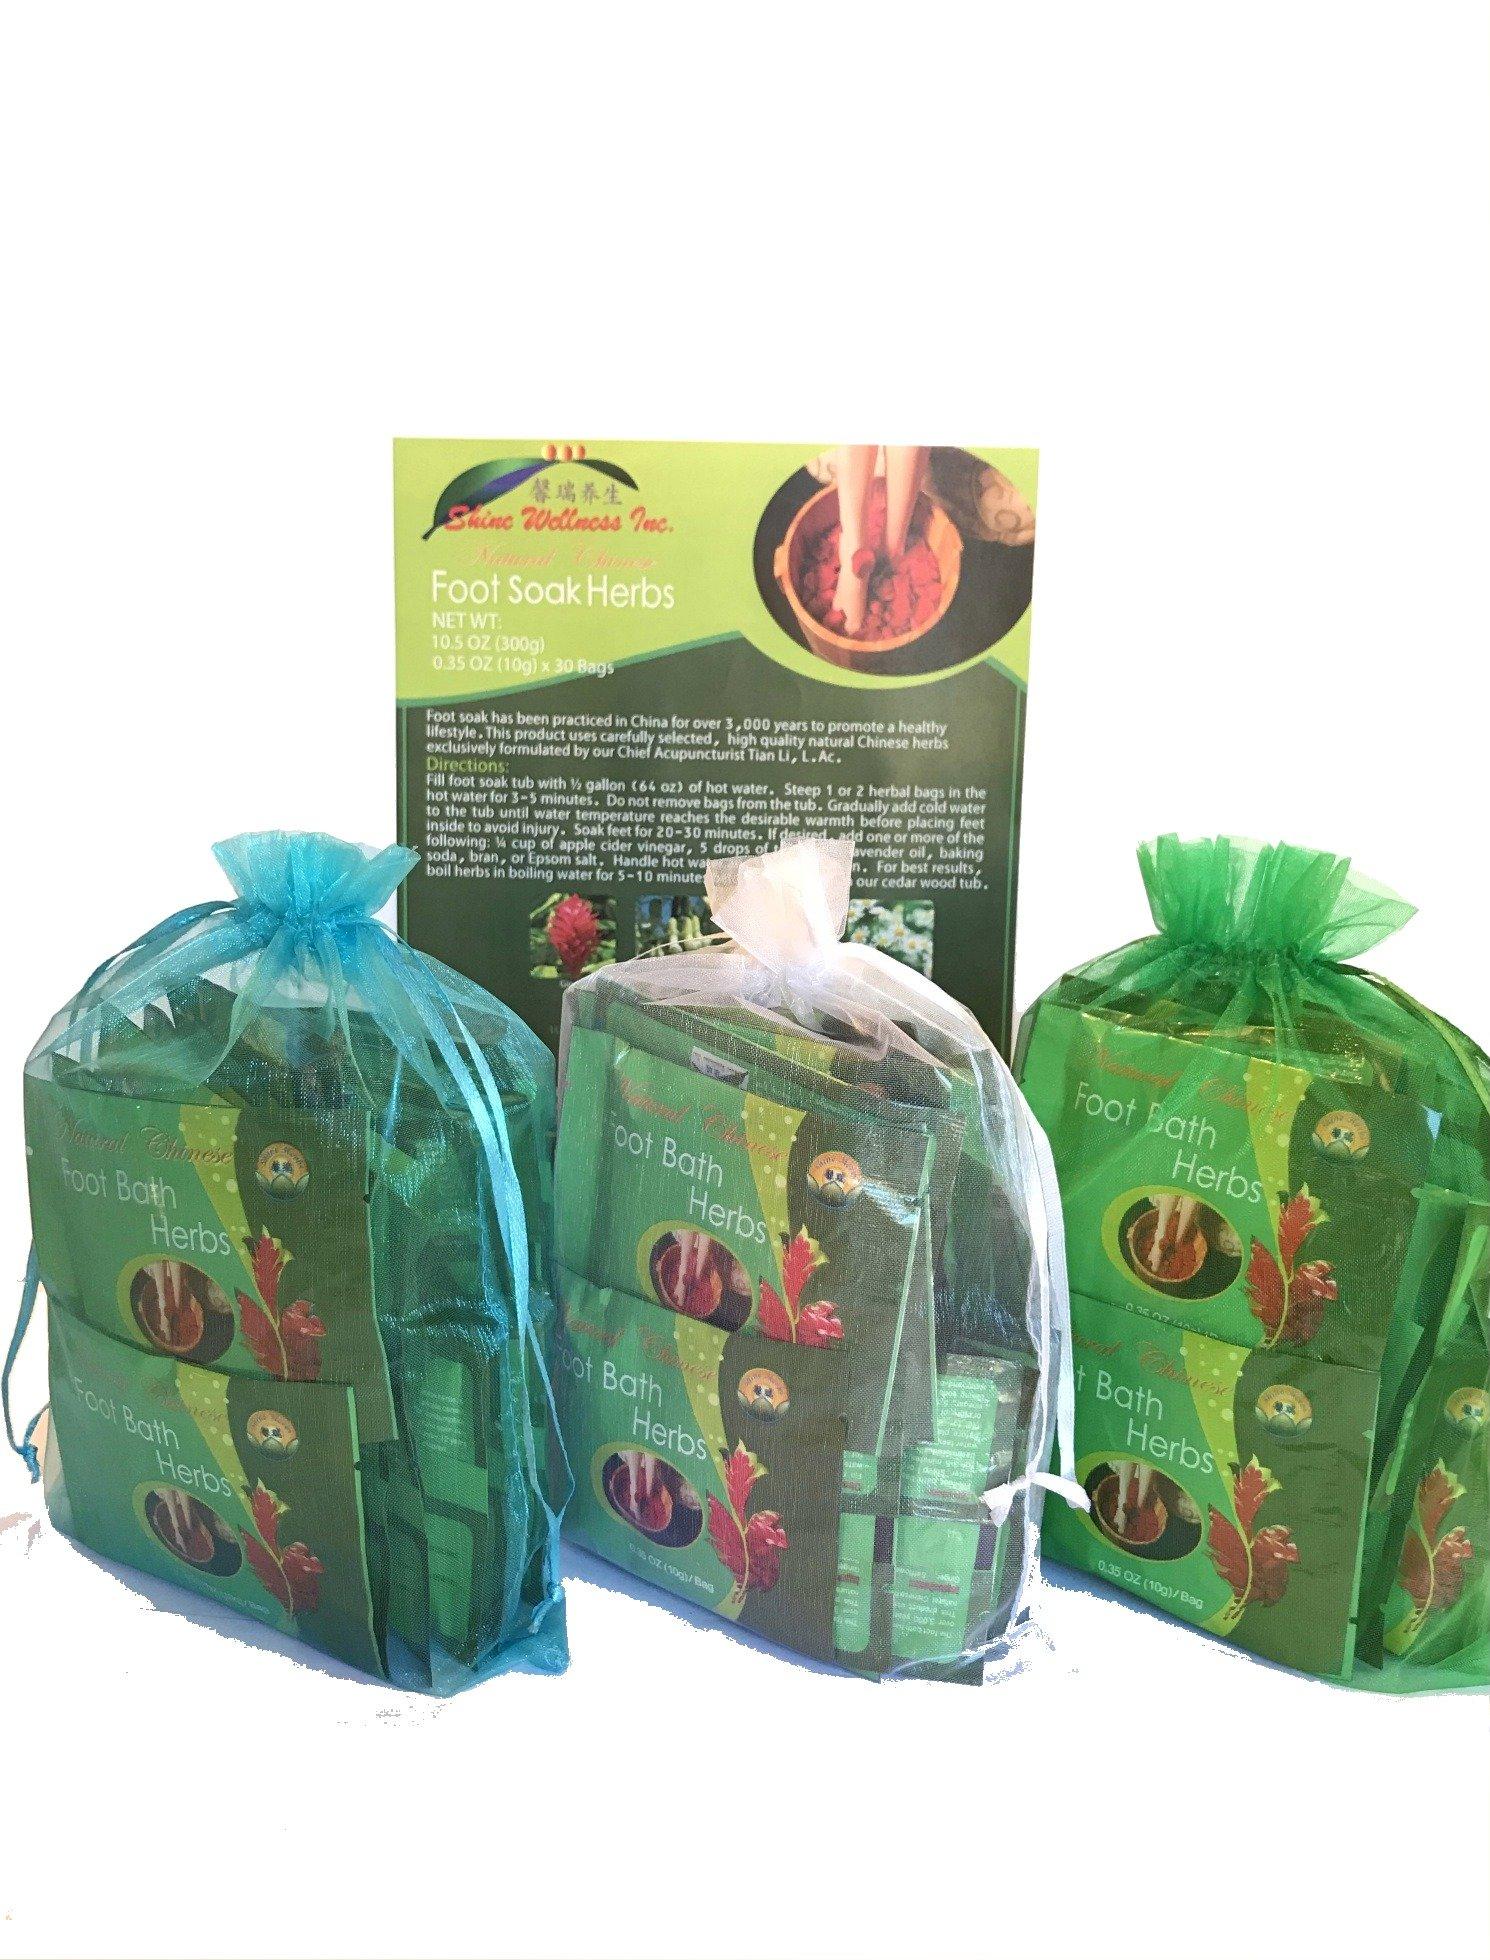 TCM Head-To-Toe Pack- 5 boxes Foot Soak Herbs Plus 2 FREE bags Mugwort & Bath Herbs samples $8 Value